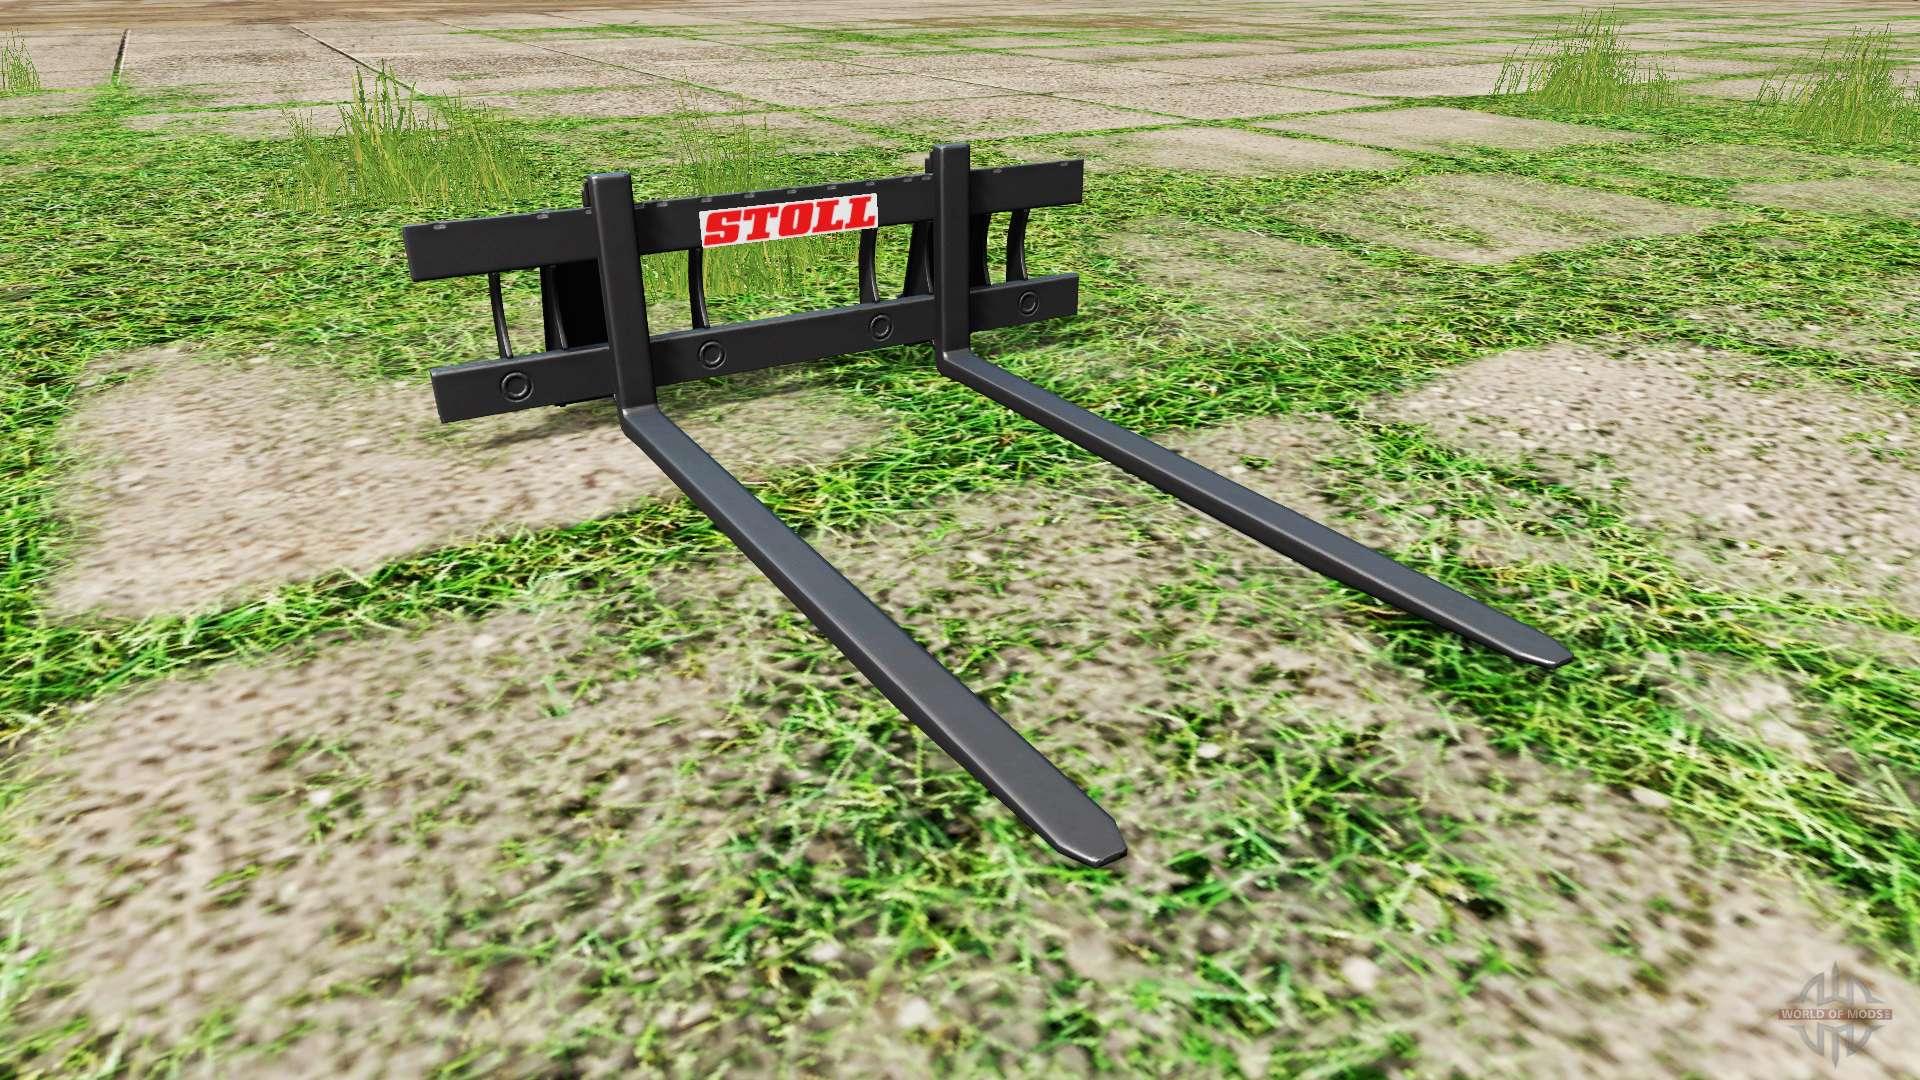 Stoll long pallet fork for Farming Simulator 2017